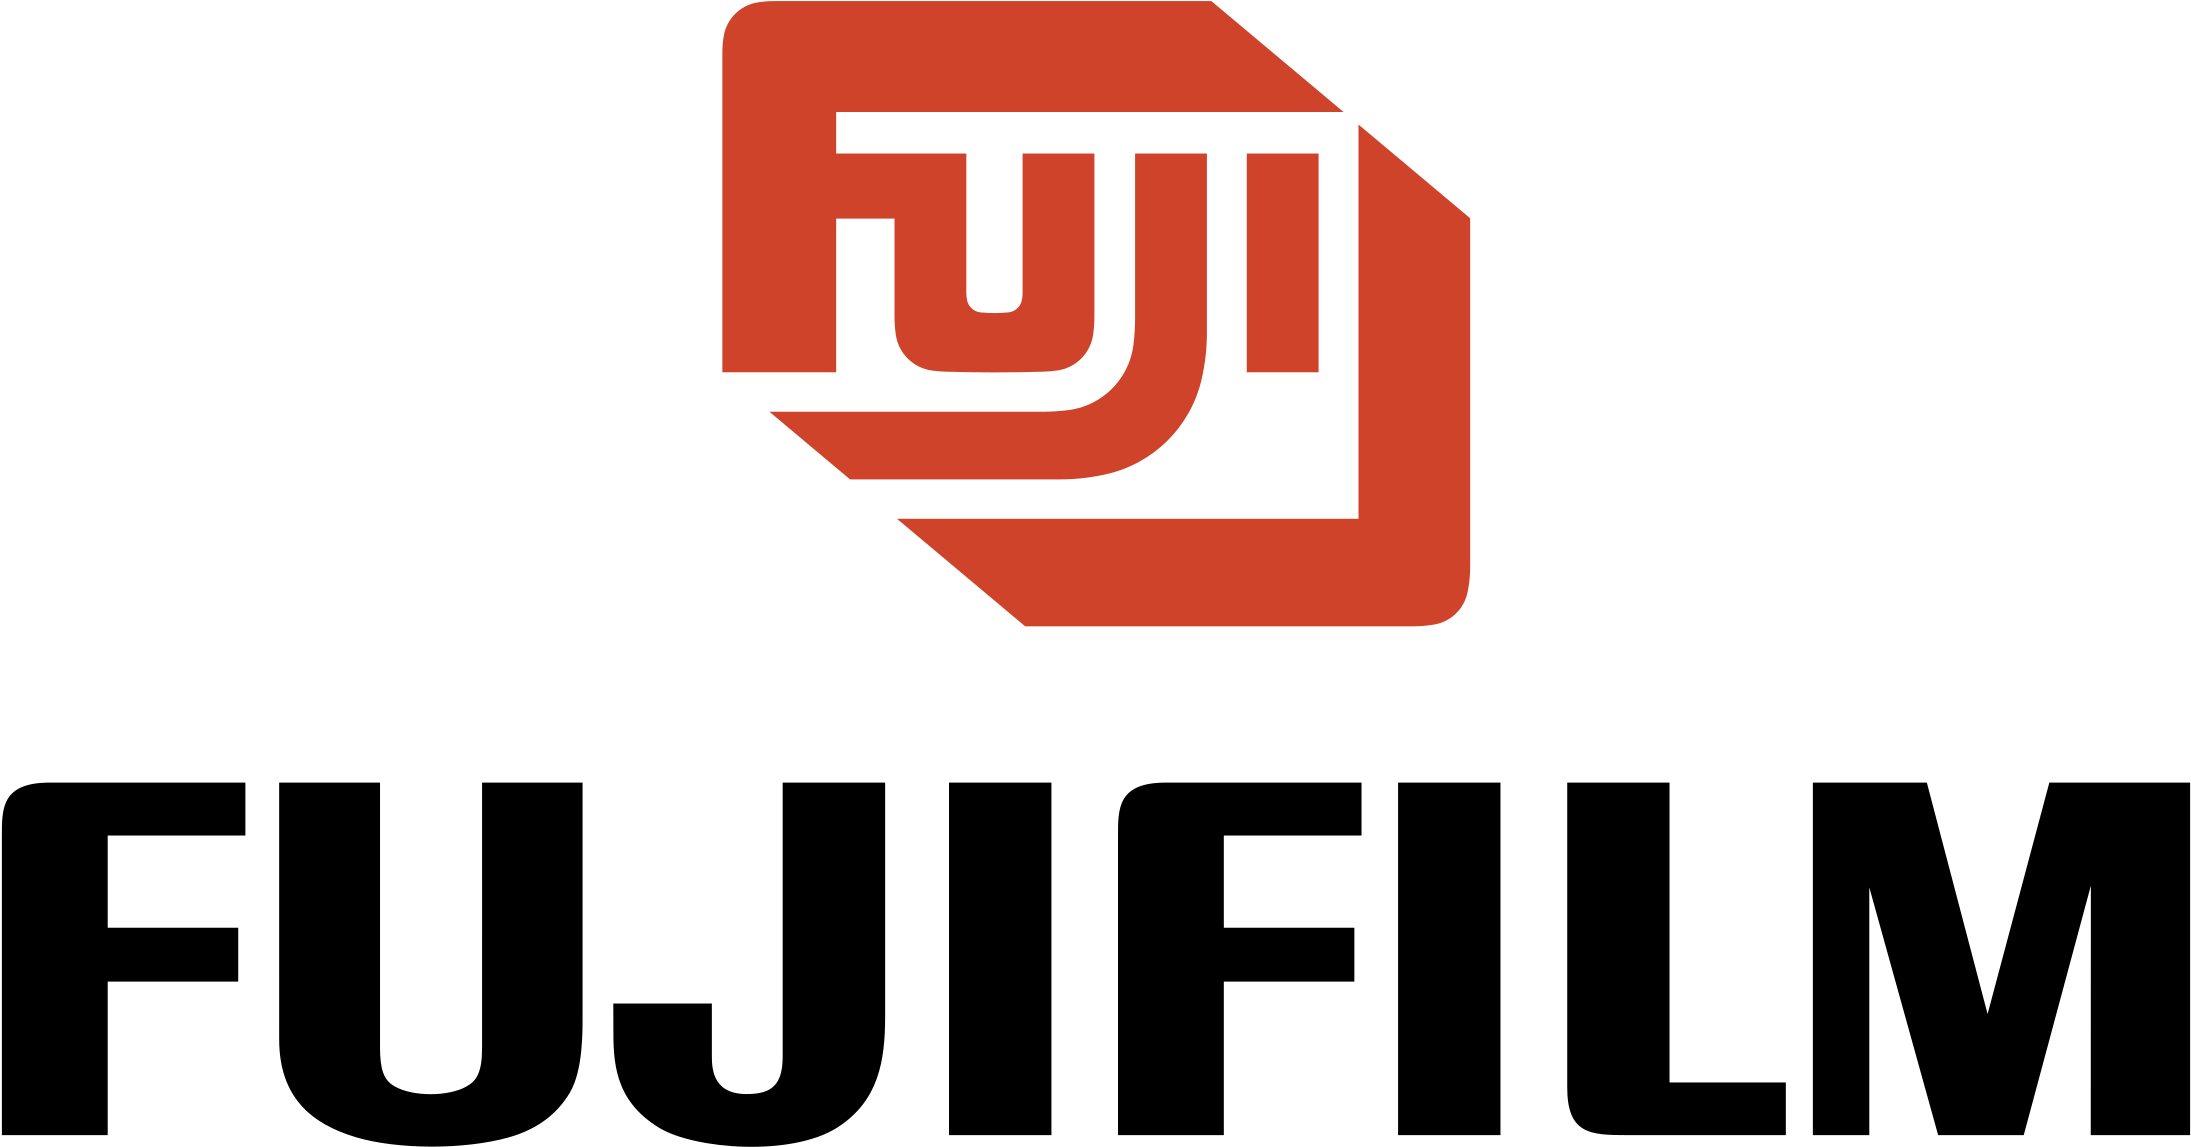 HD Fujifilm Logo Png Transparent.